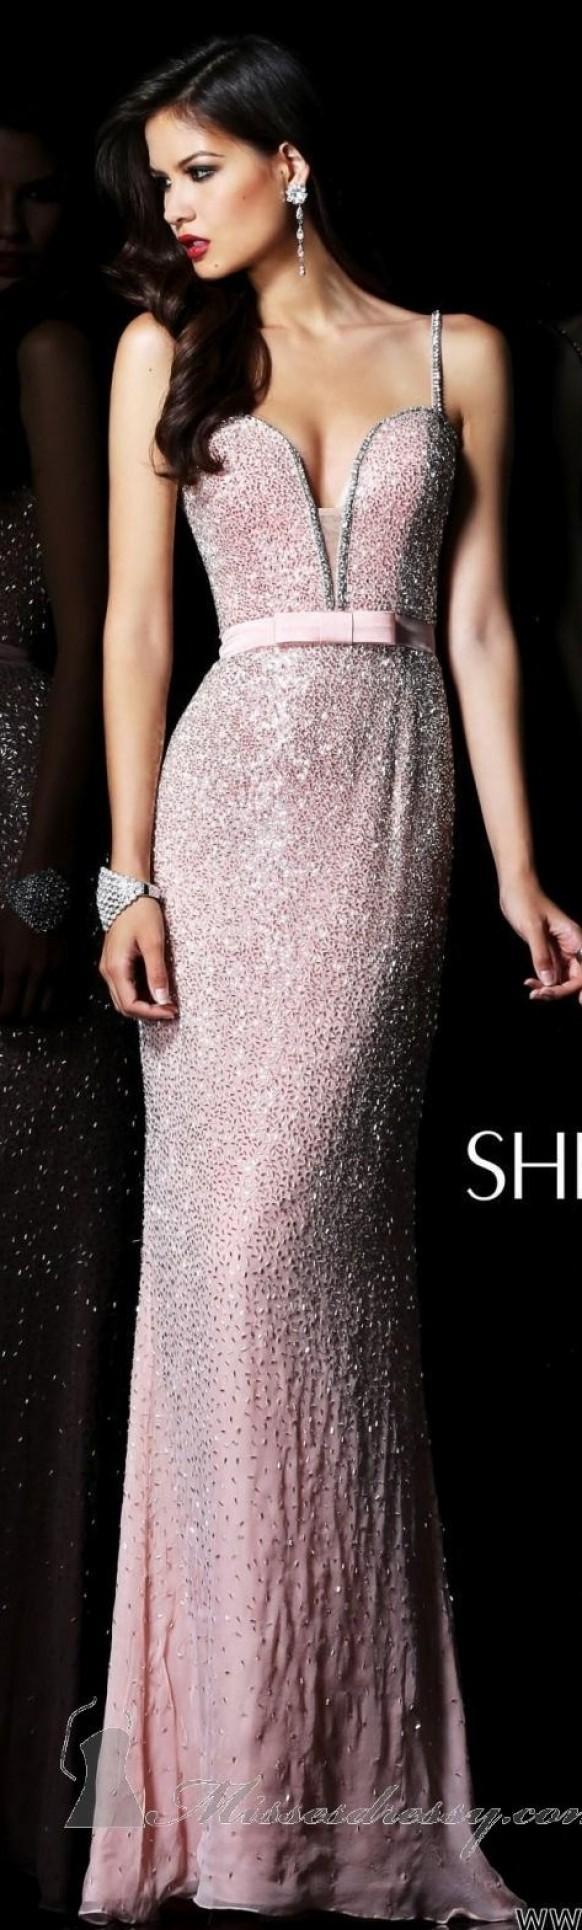 Sherri Hill Couture ~ rosa | Fashion Dress | Pinterest | Brautkleid ...